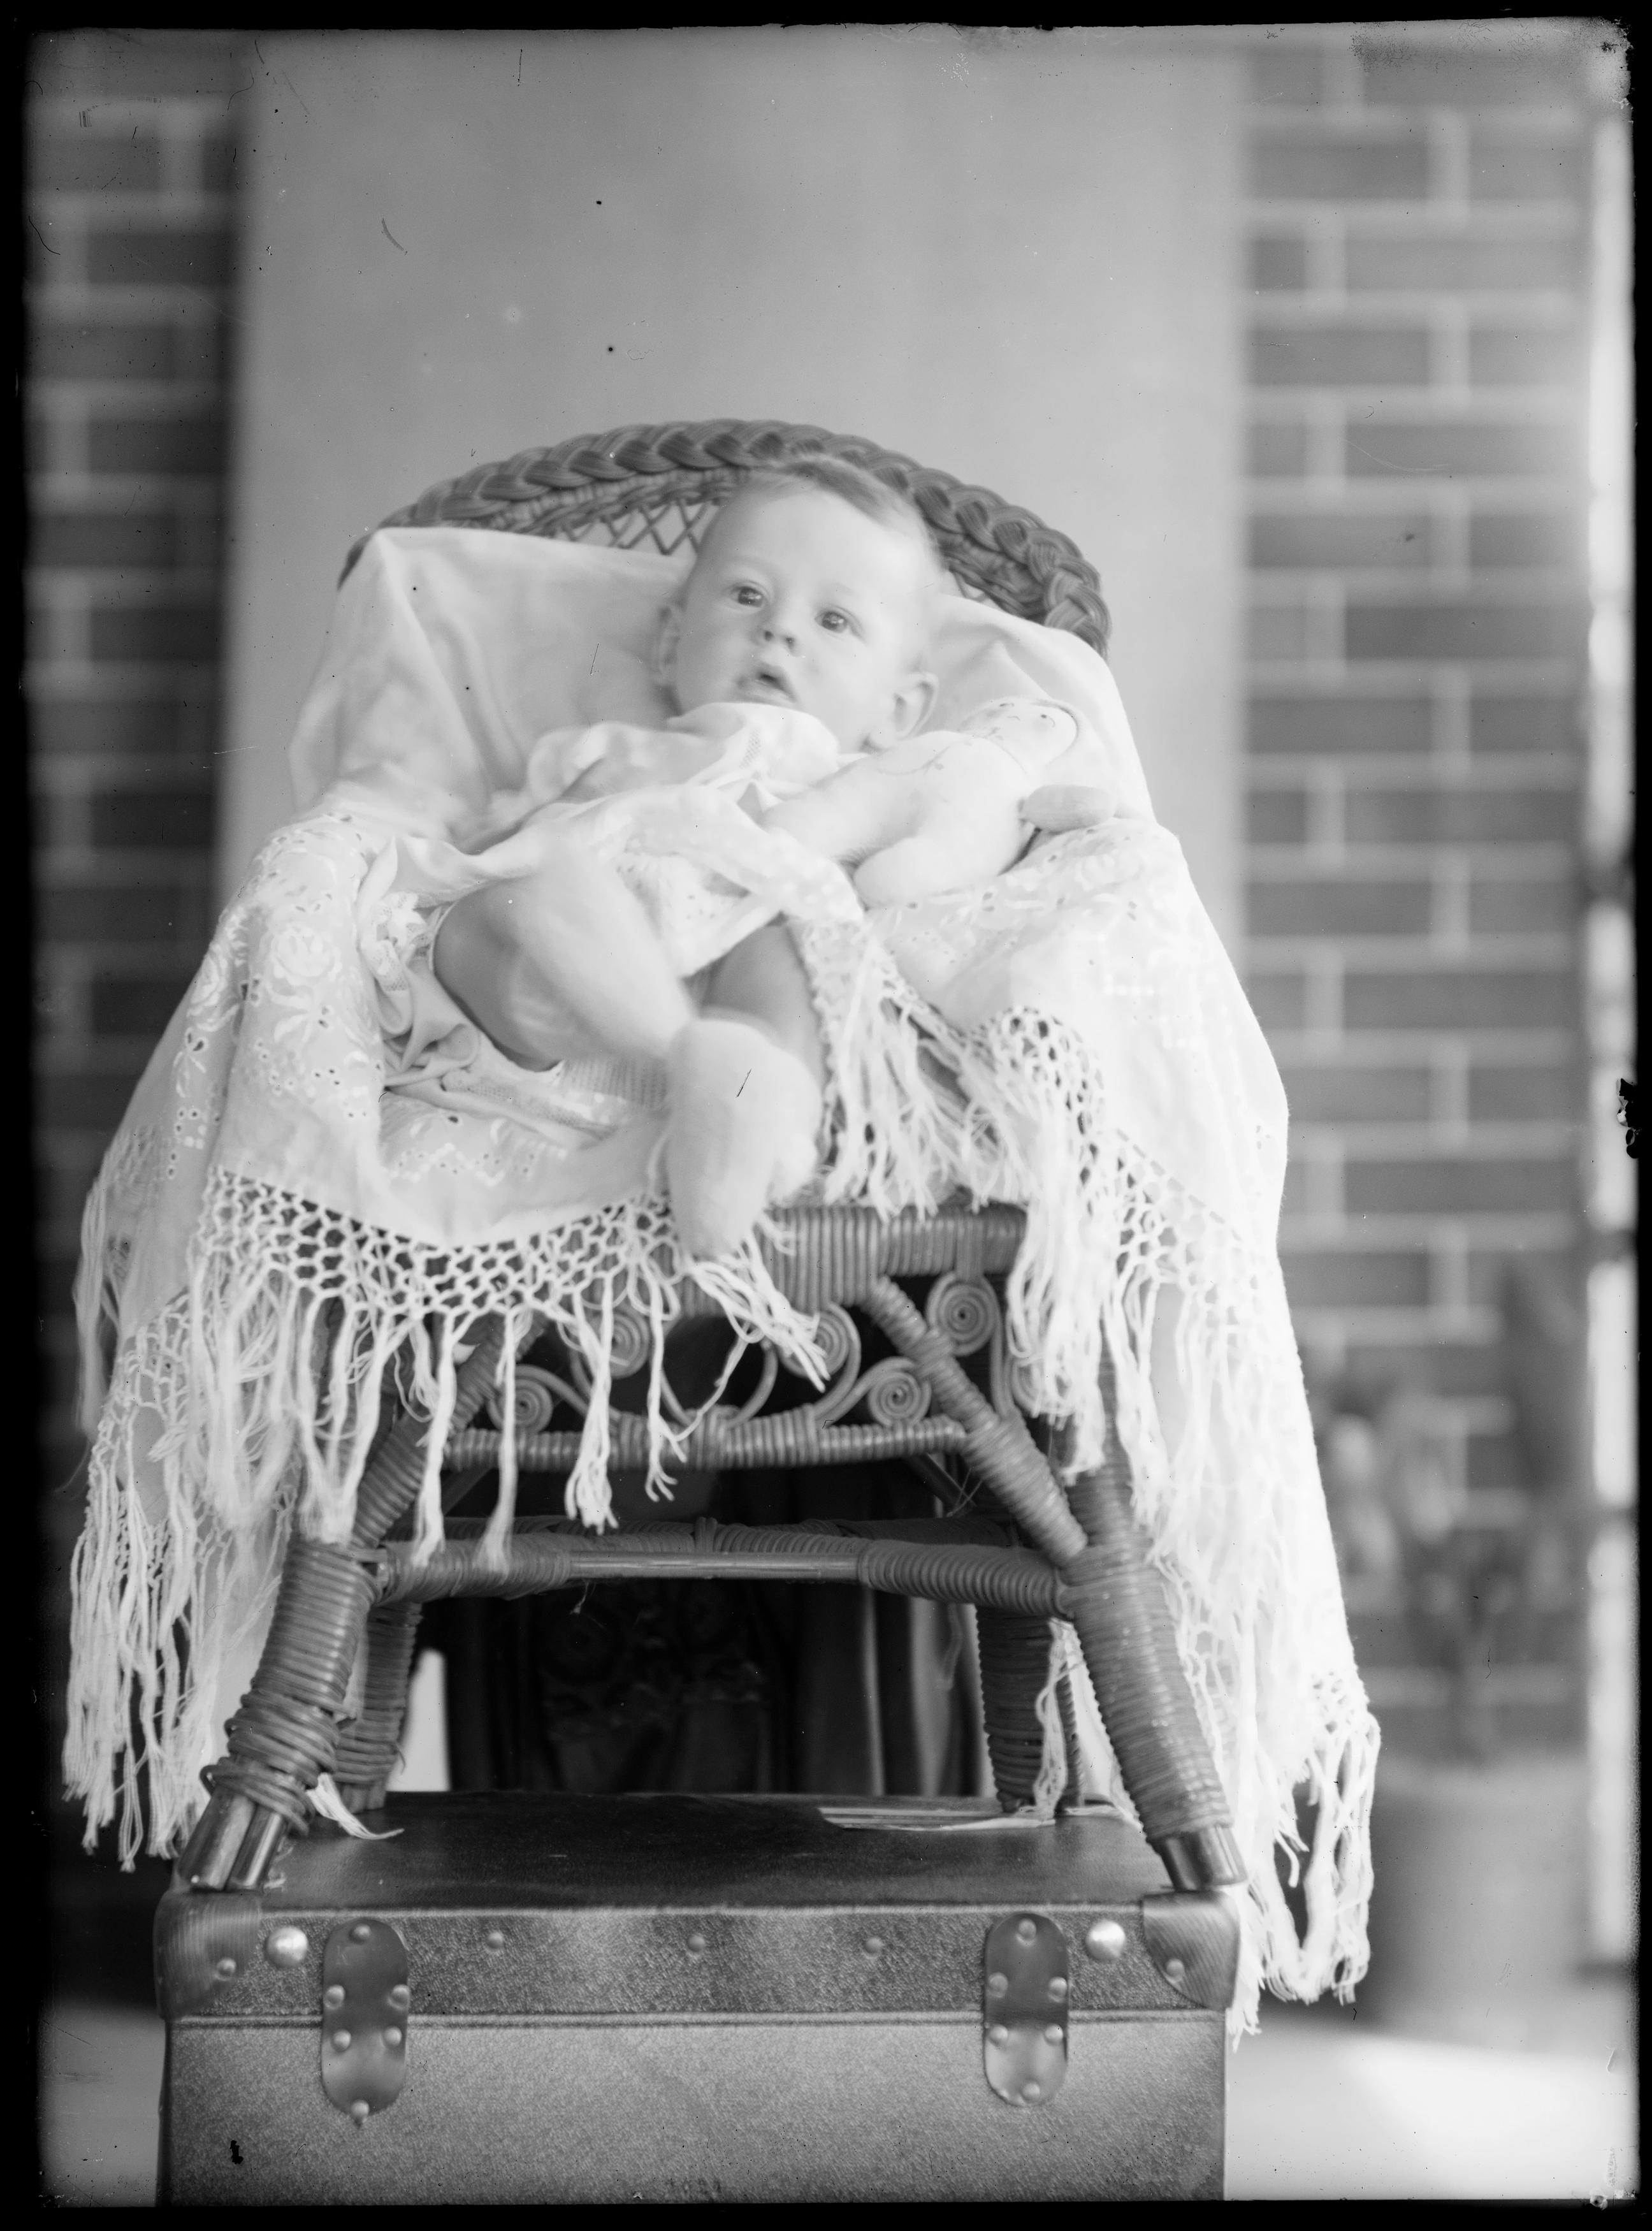 Edward Barrie Macpherson (1925-2015), at 29 Hale Rd, Mosman